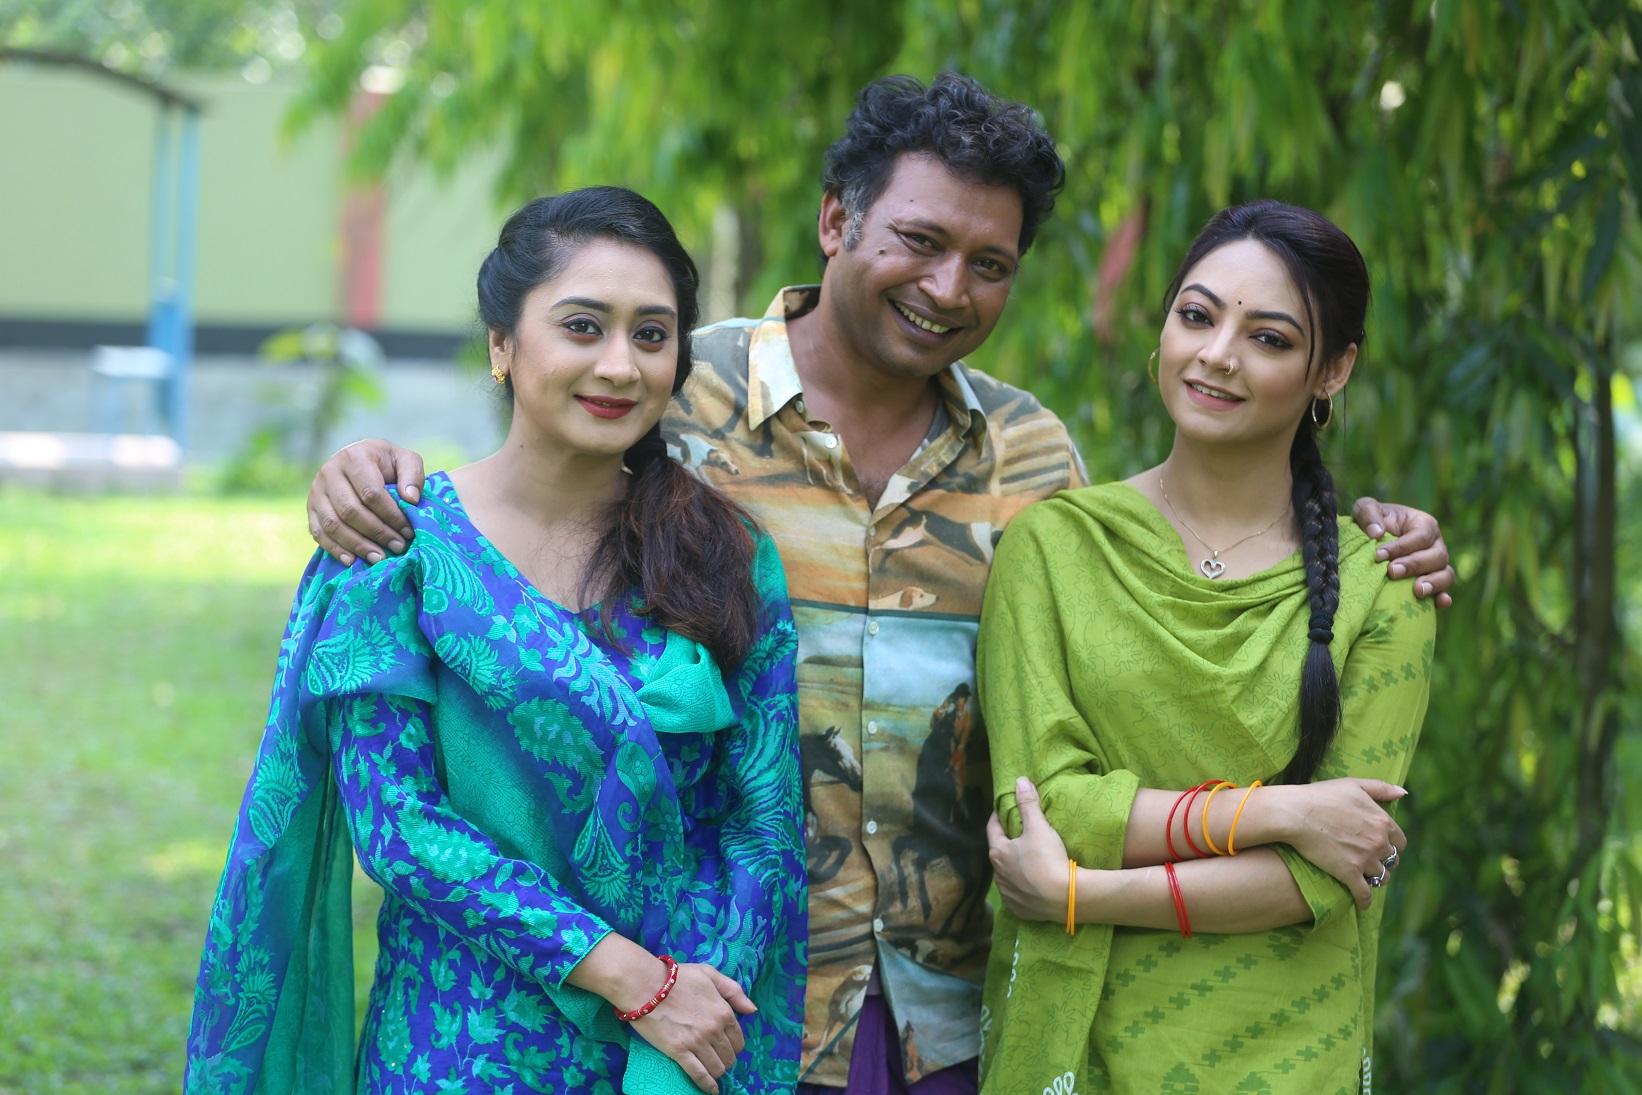 Swagota, Pran, Ishana's serial Chirokumari Sangho